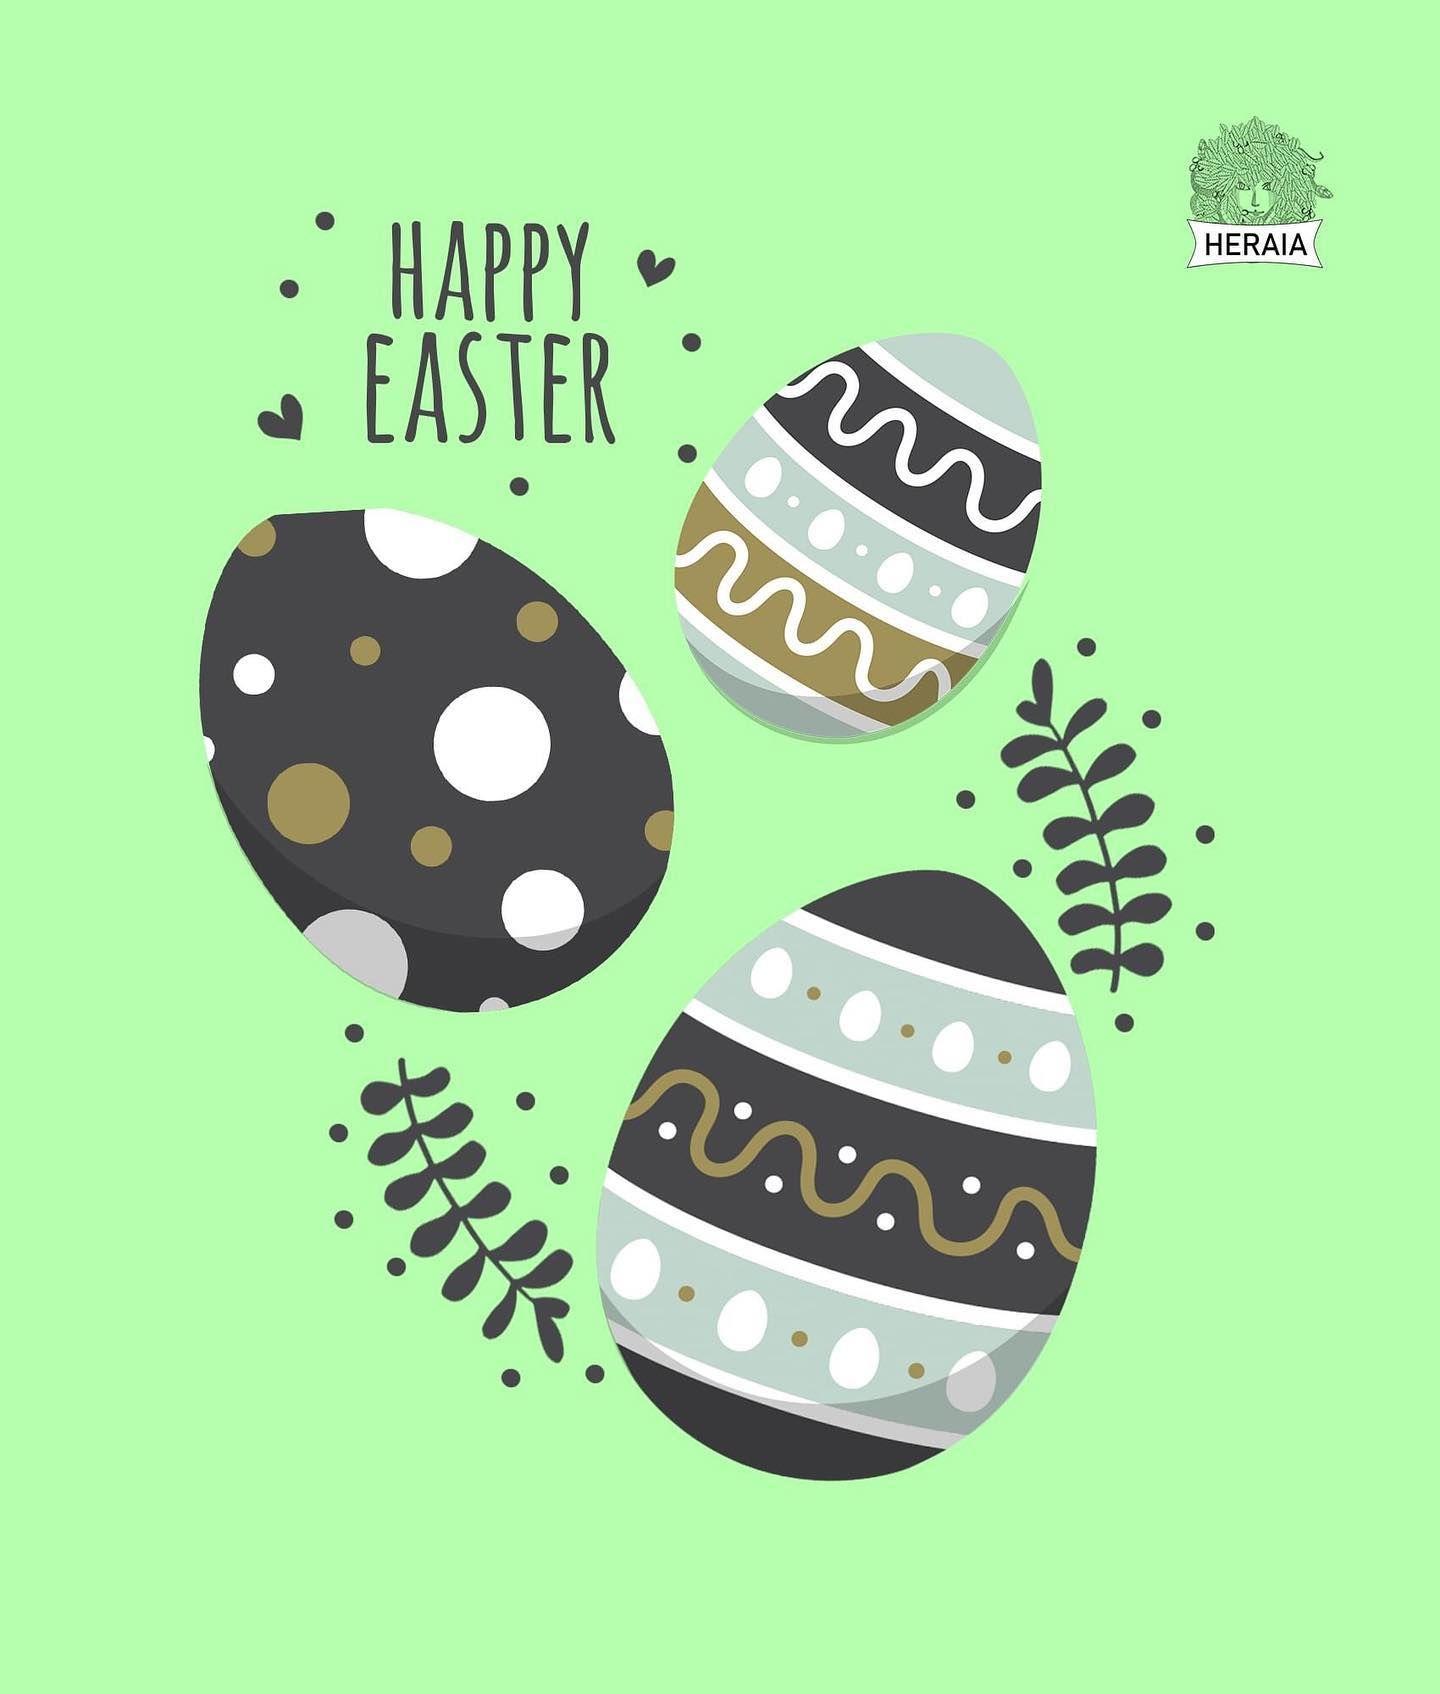 Happy Easter By The Sicilian Gorgon Heraia Heraia Heraiasicily Entroterrasiciliano Gorgonesiciliana Trinacria Pasqua Buonapa In 2020 Happy Easter Easter Happy